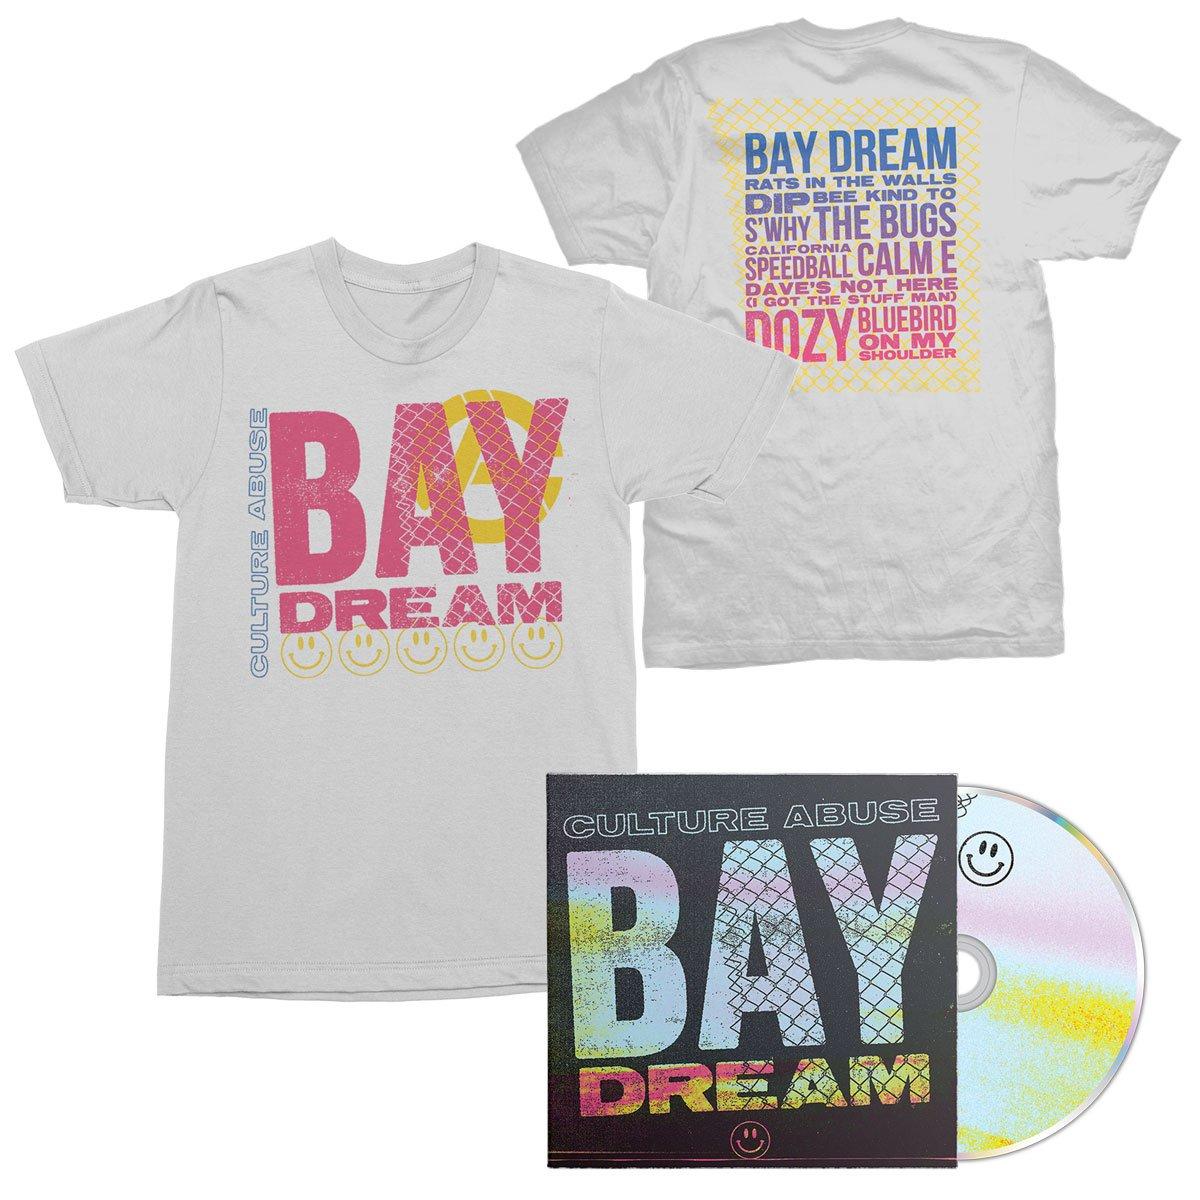 IMAGE | Bay Dream CD + Bay Dream Tee (White) Bundle